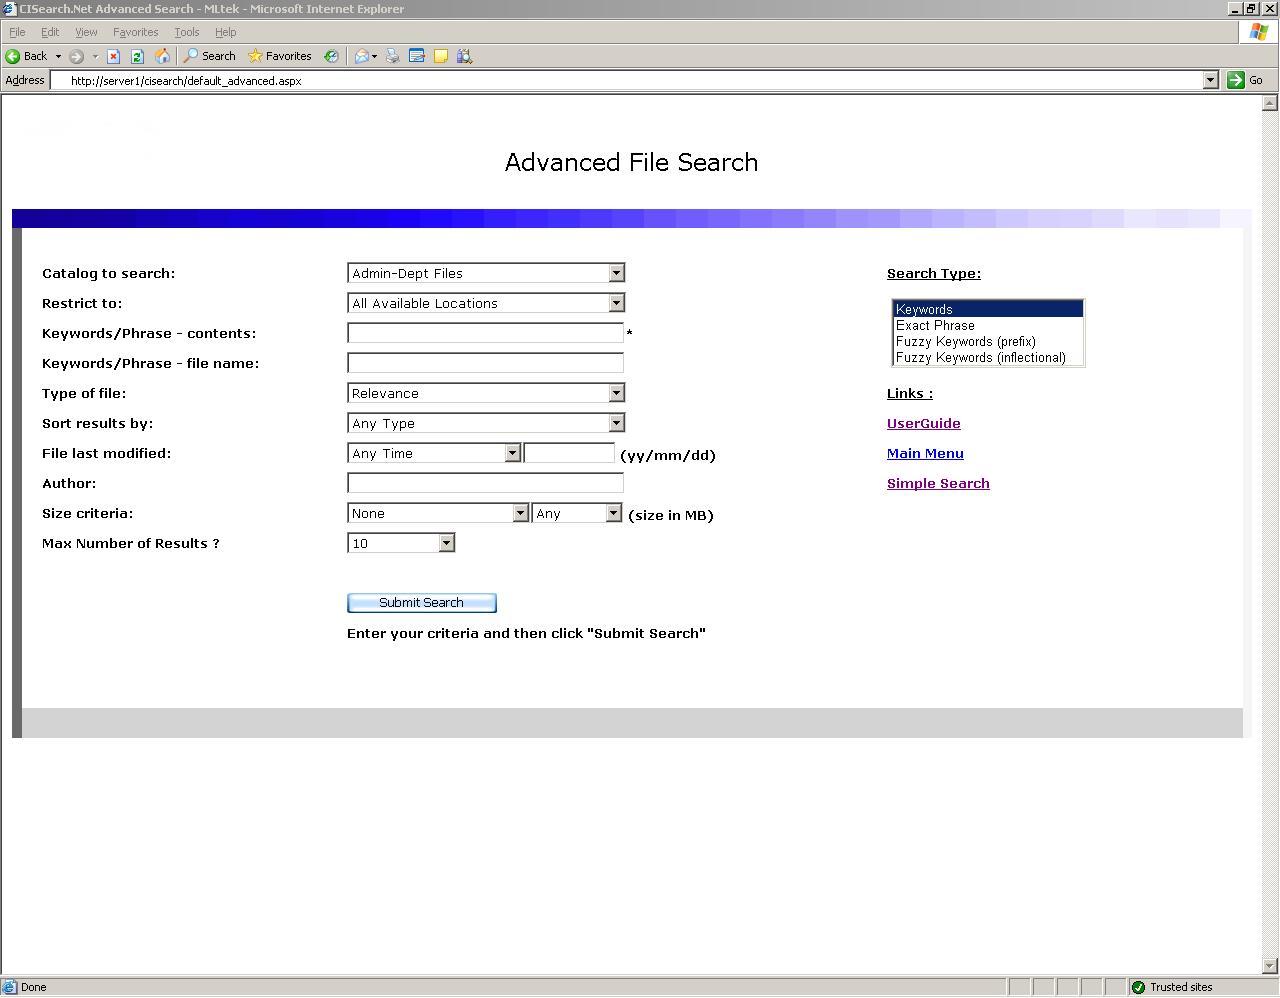 CISearch.NET